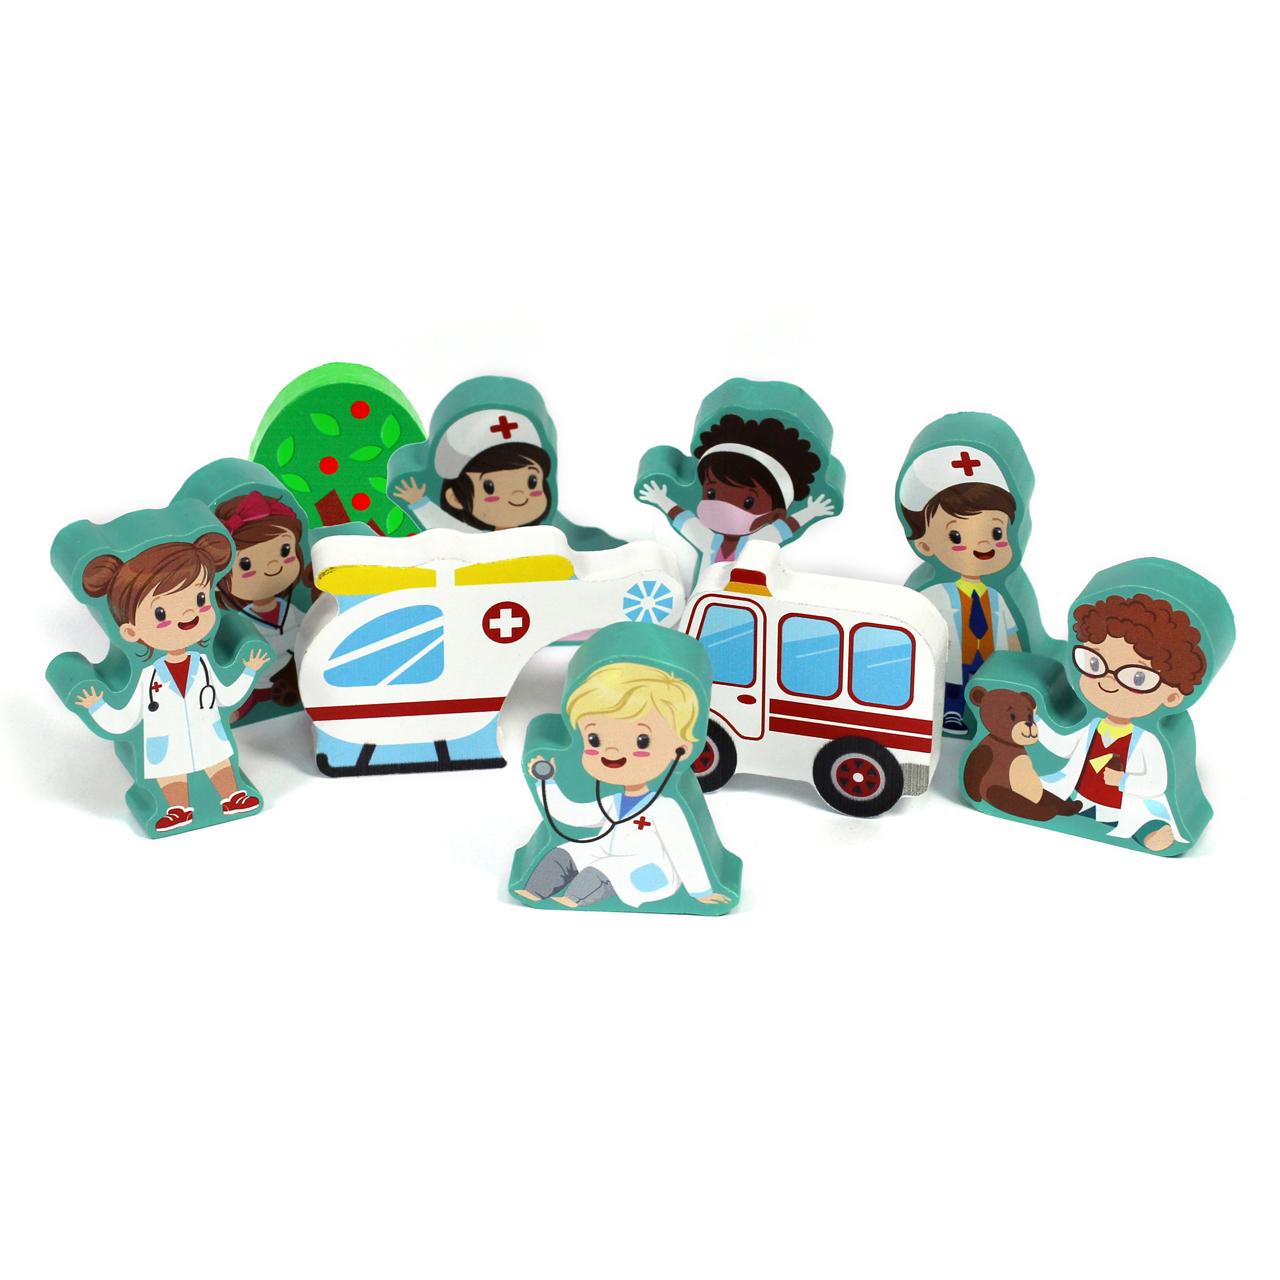 10Pc 15mm Thick Ambulance Character Group